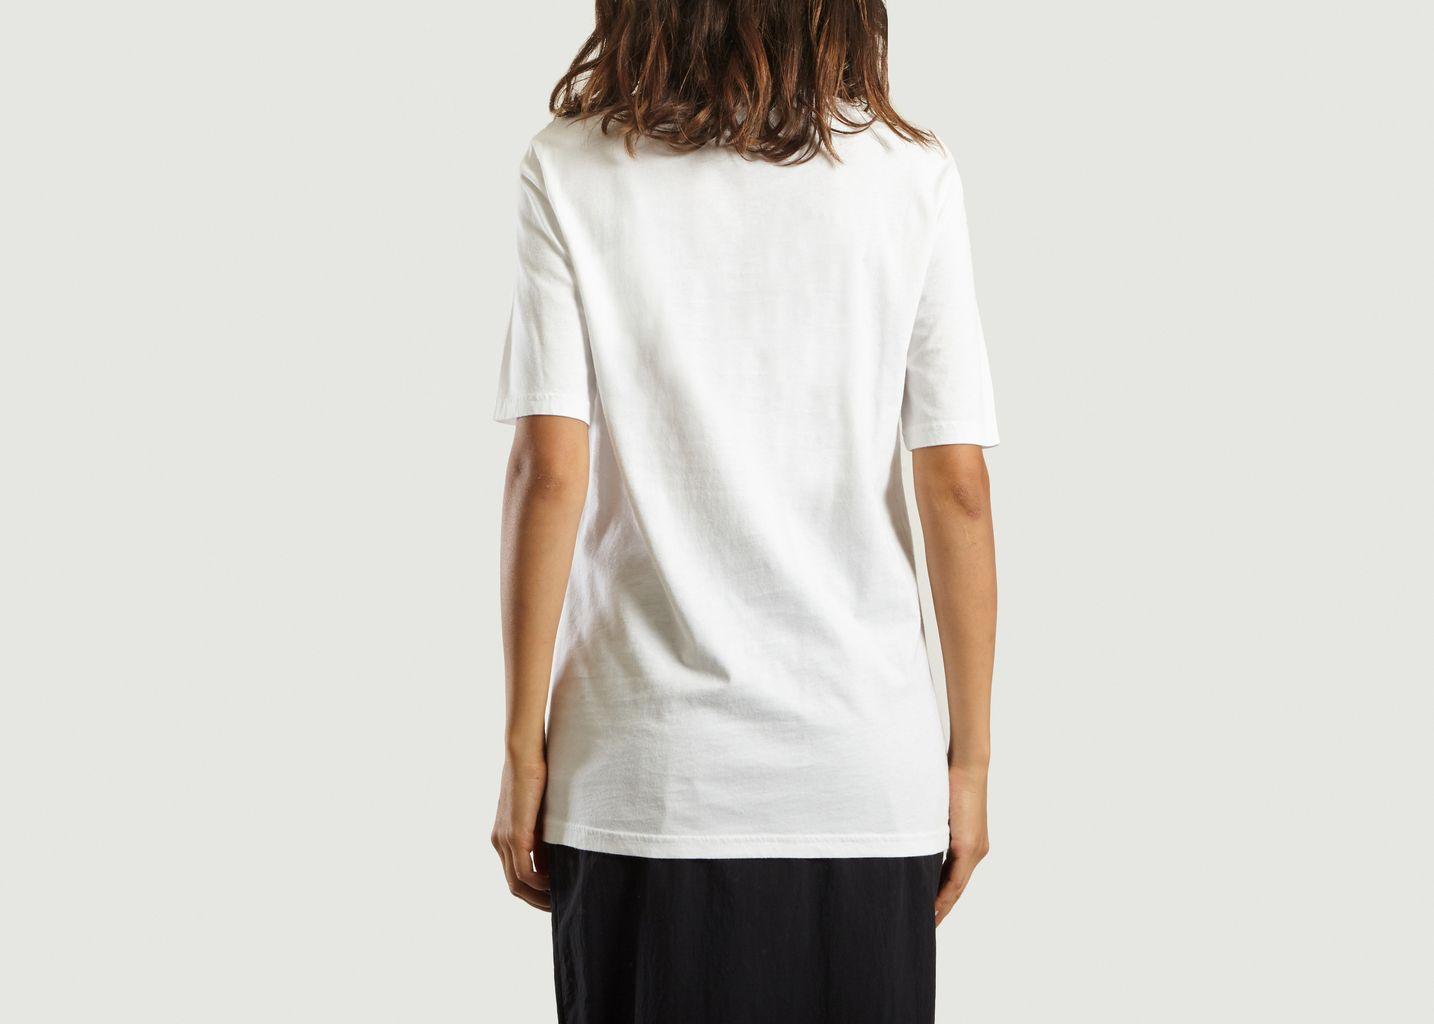 T-shirt Dot - Loreak Mendian